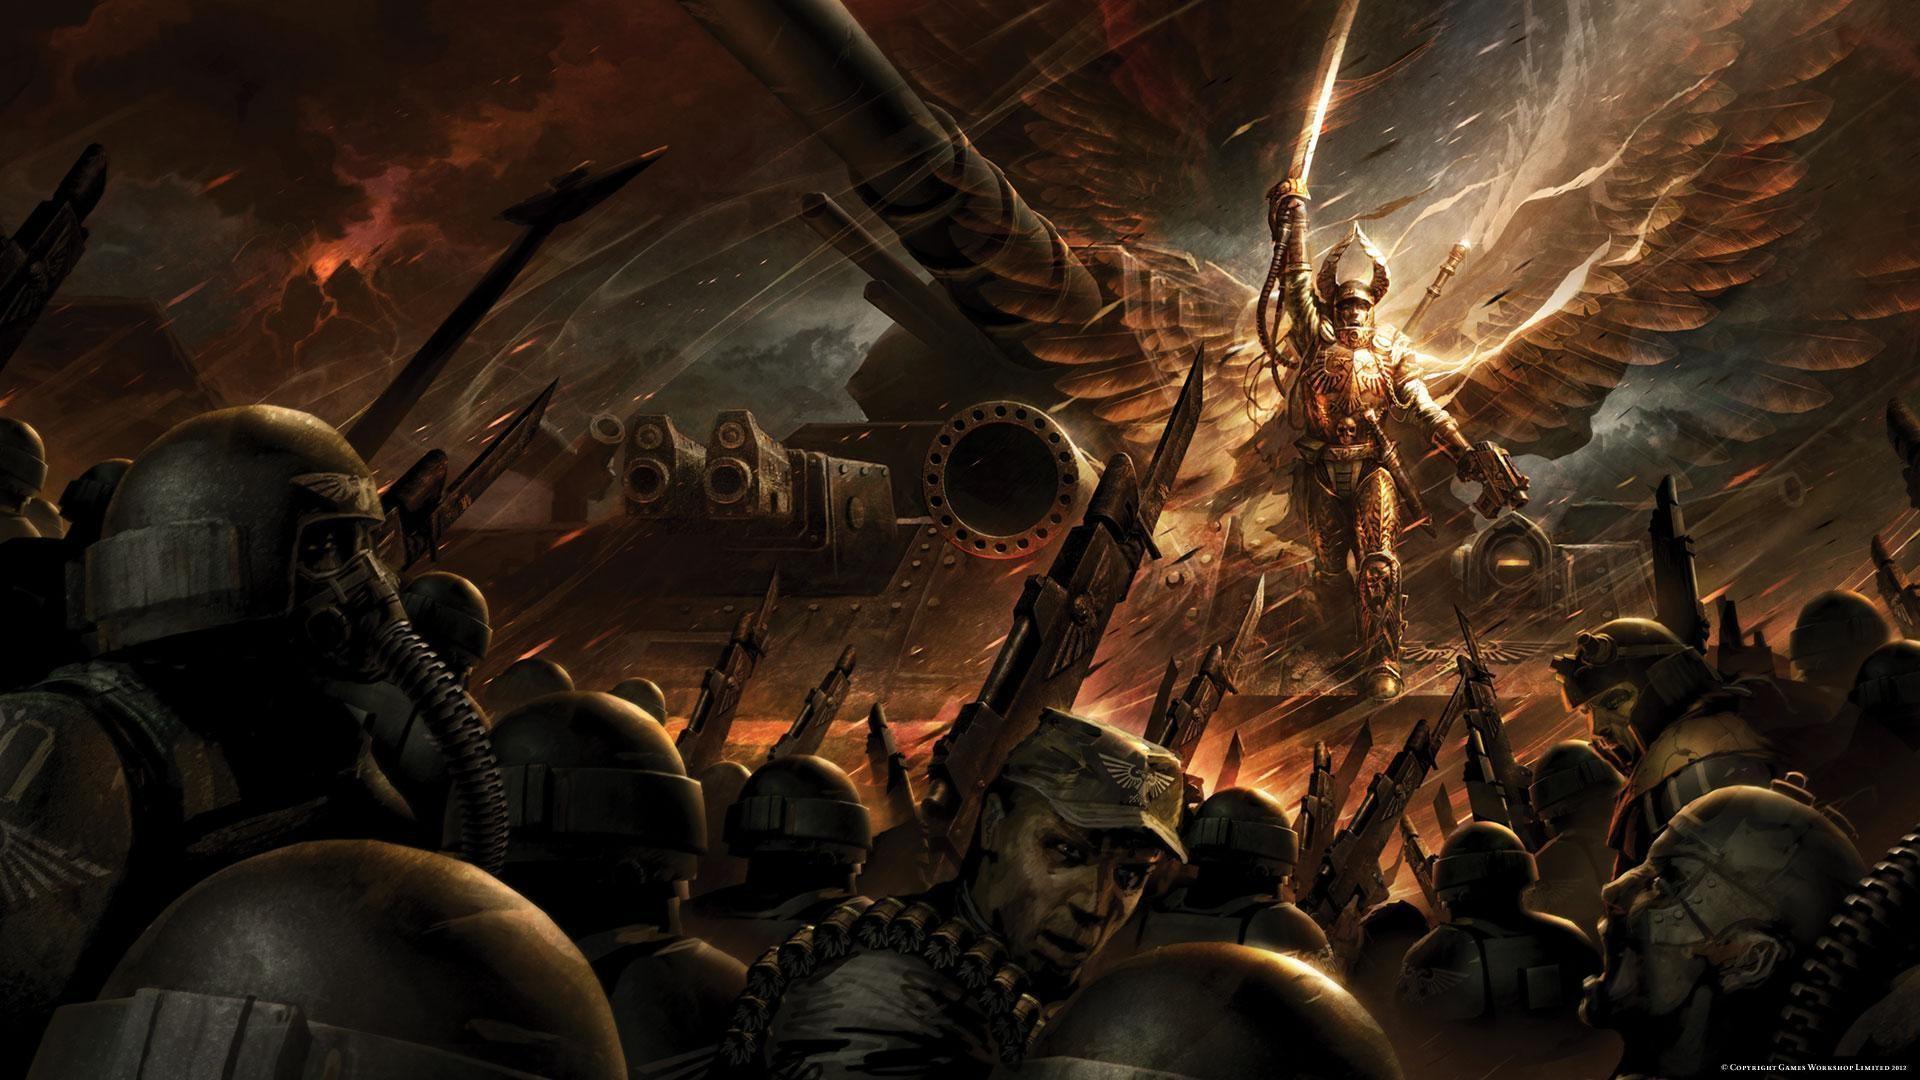 49 Warhammer 40k Imperial Guard Wallpaper On Wallpapersafari